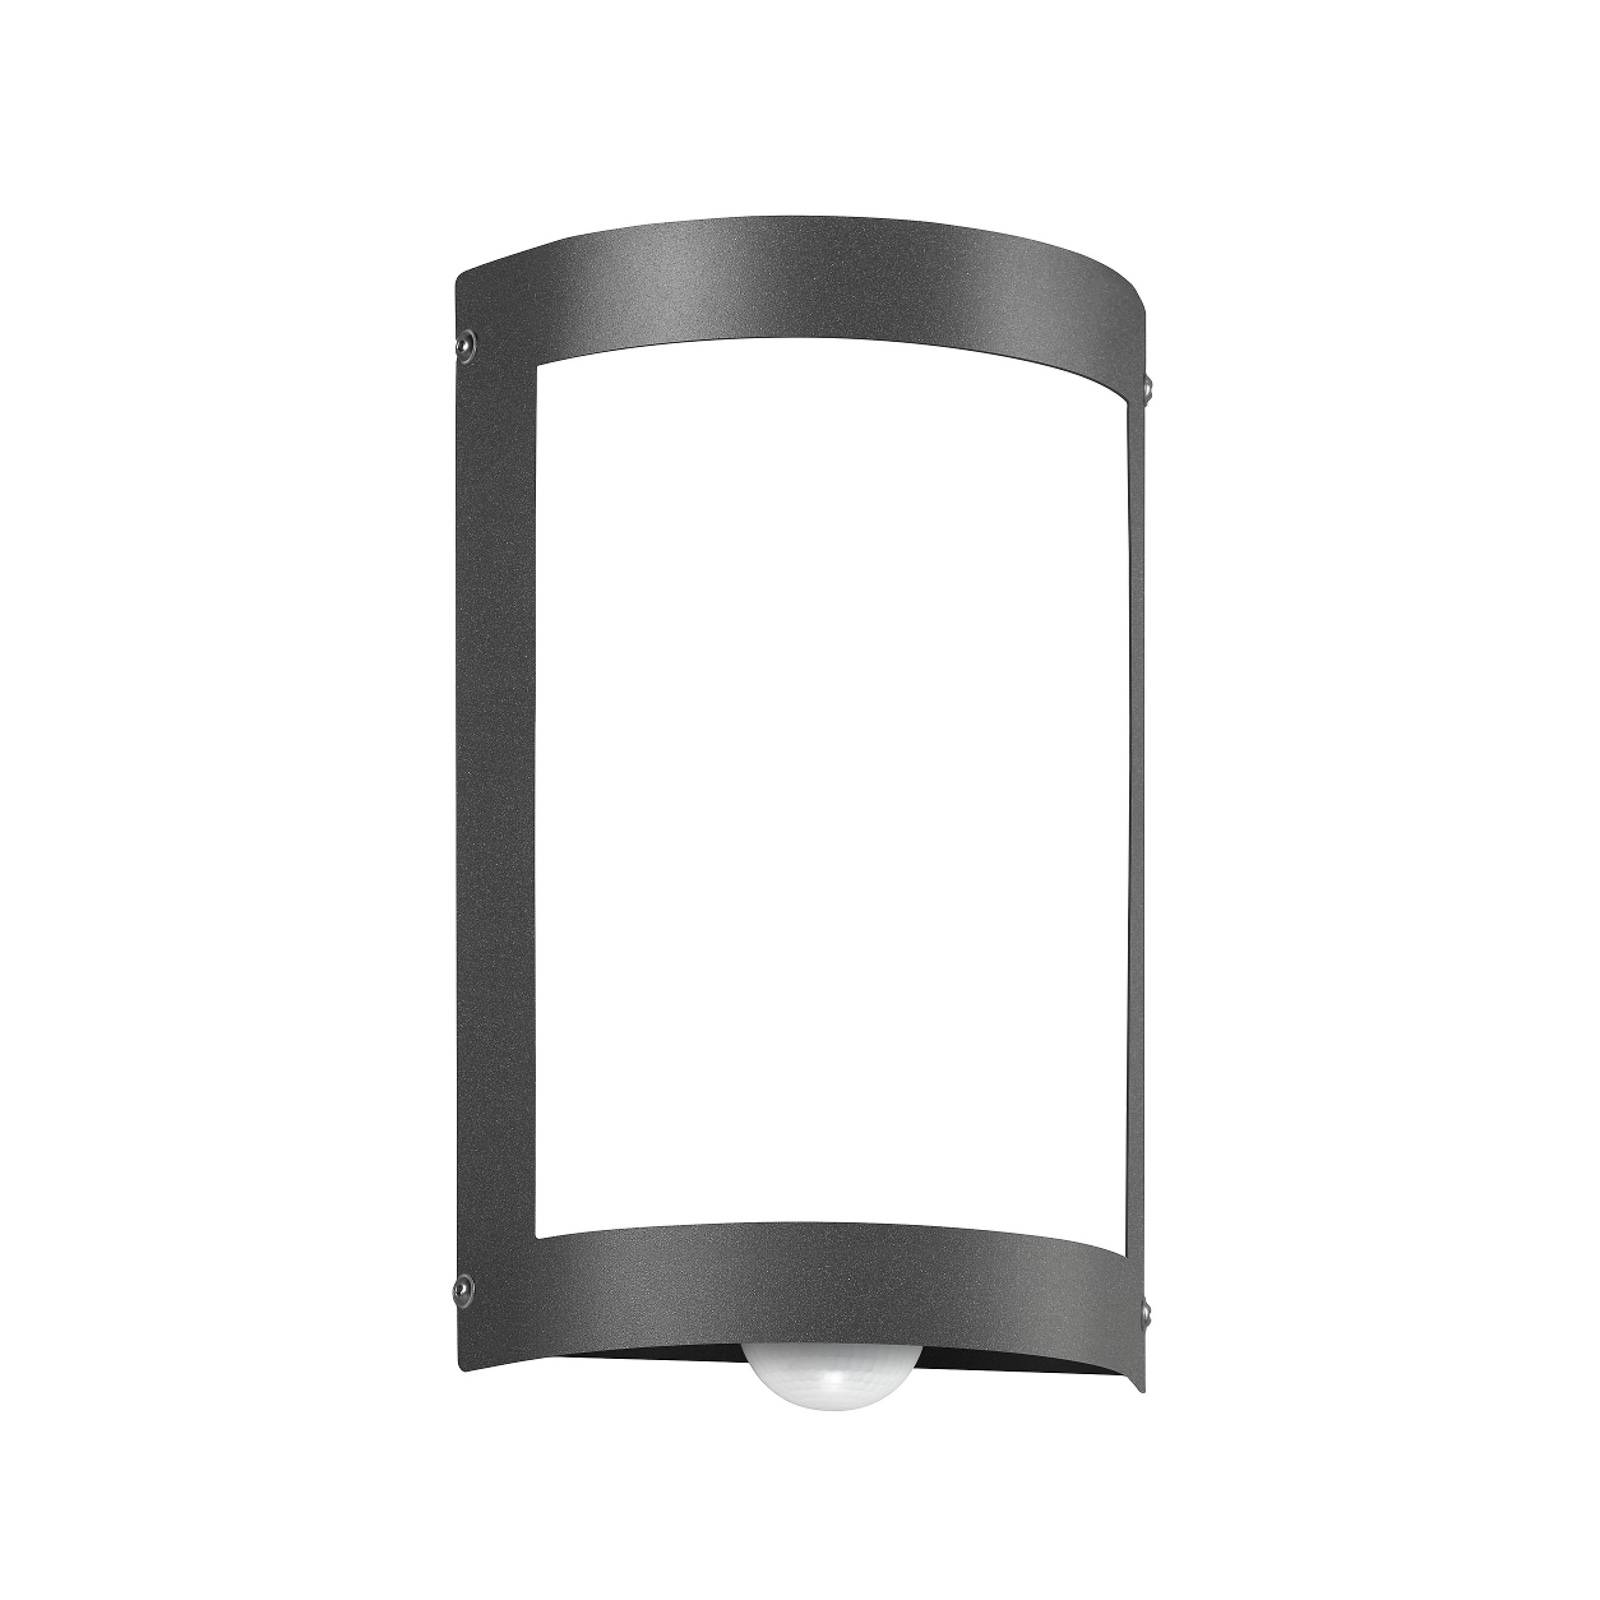 Sensor-Außenlampe Aqua Marco ohne Raster anthrazit